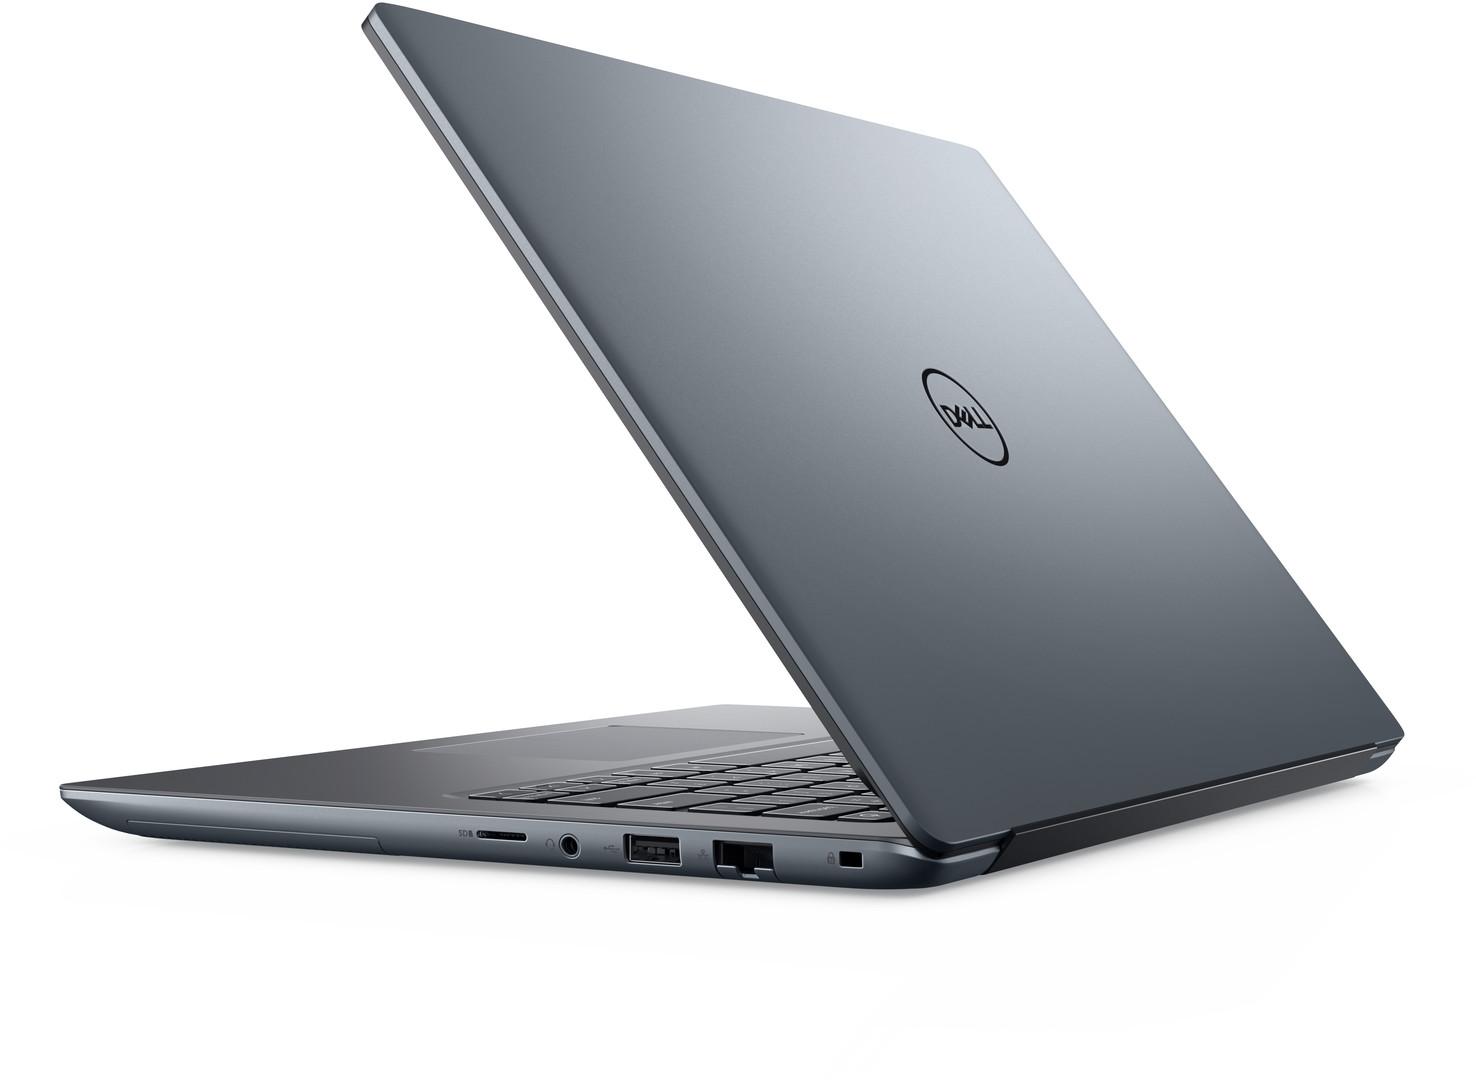 Notebook Dell Vostro 5490 Core I5 10210u Memoria 8gb Ssd 256gb Placa De Video Mx230  Tela 14' Fhd Windows 10 Pro